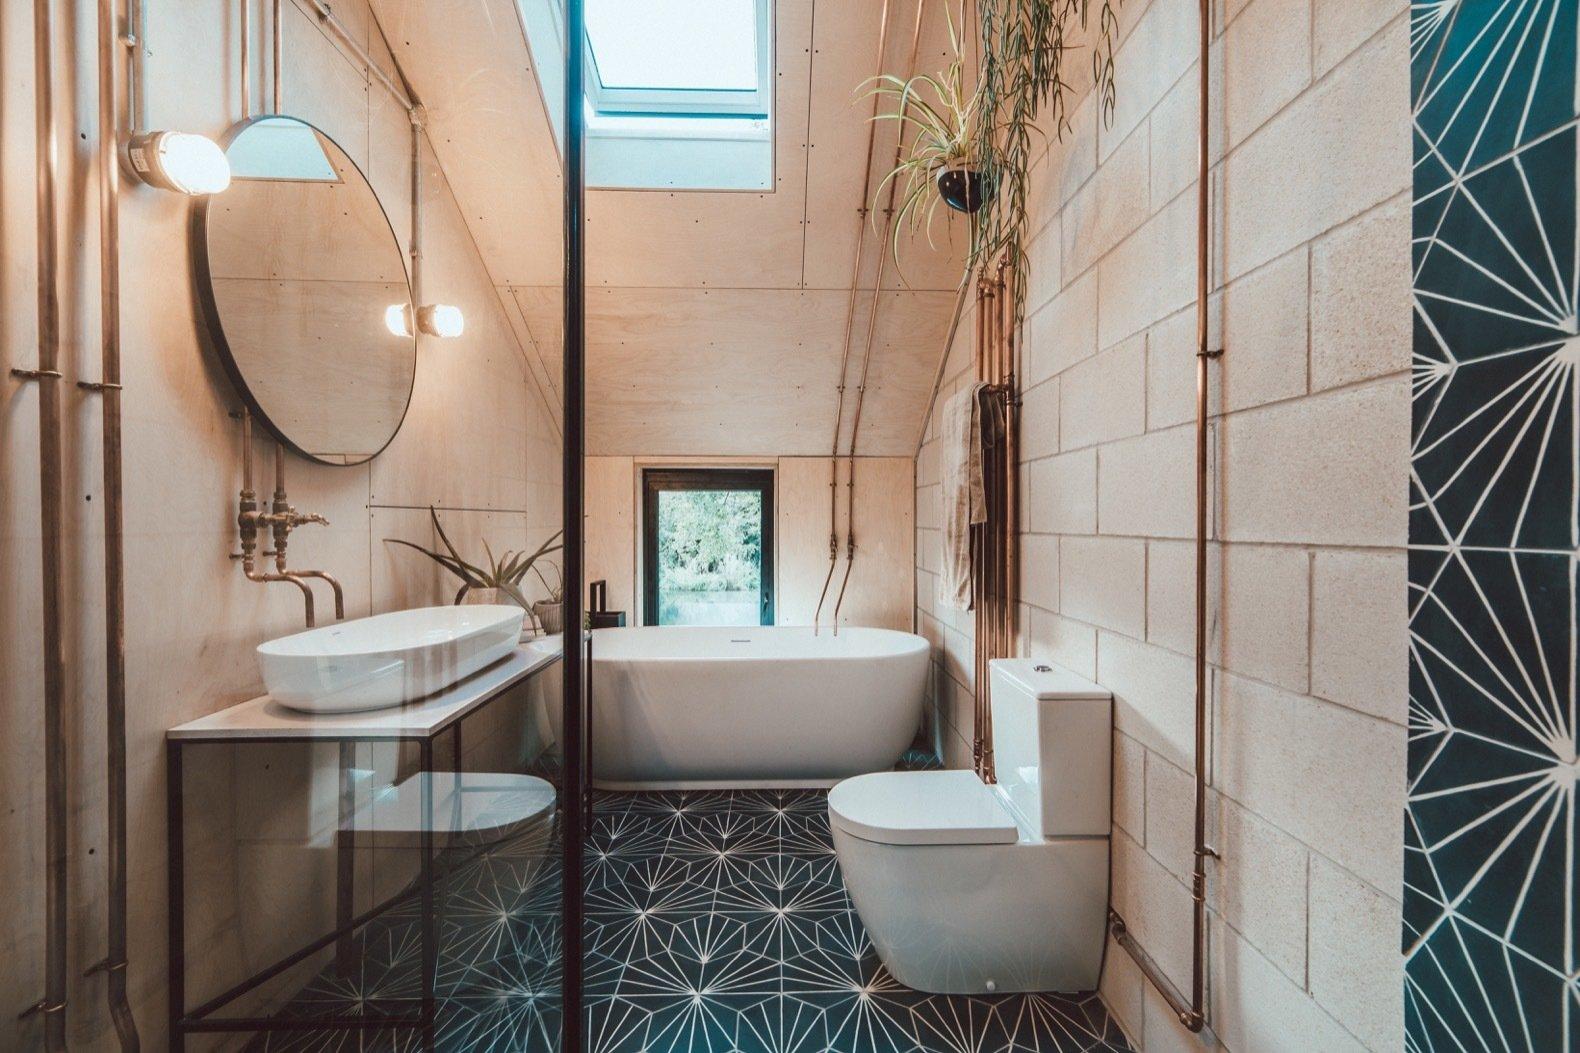 Corn Yard master bathroom with geometric tiles